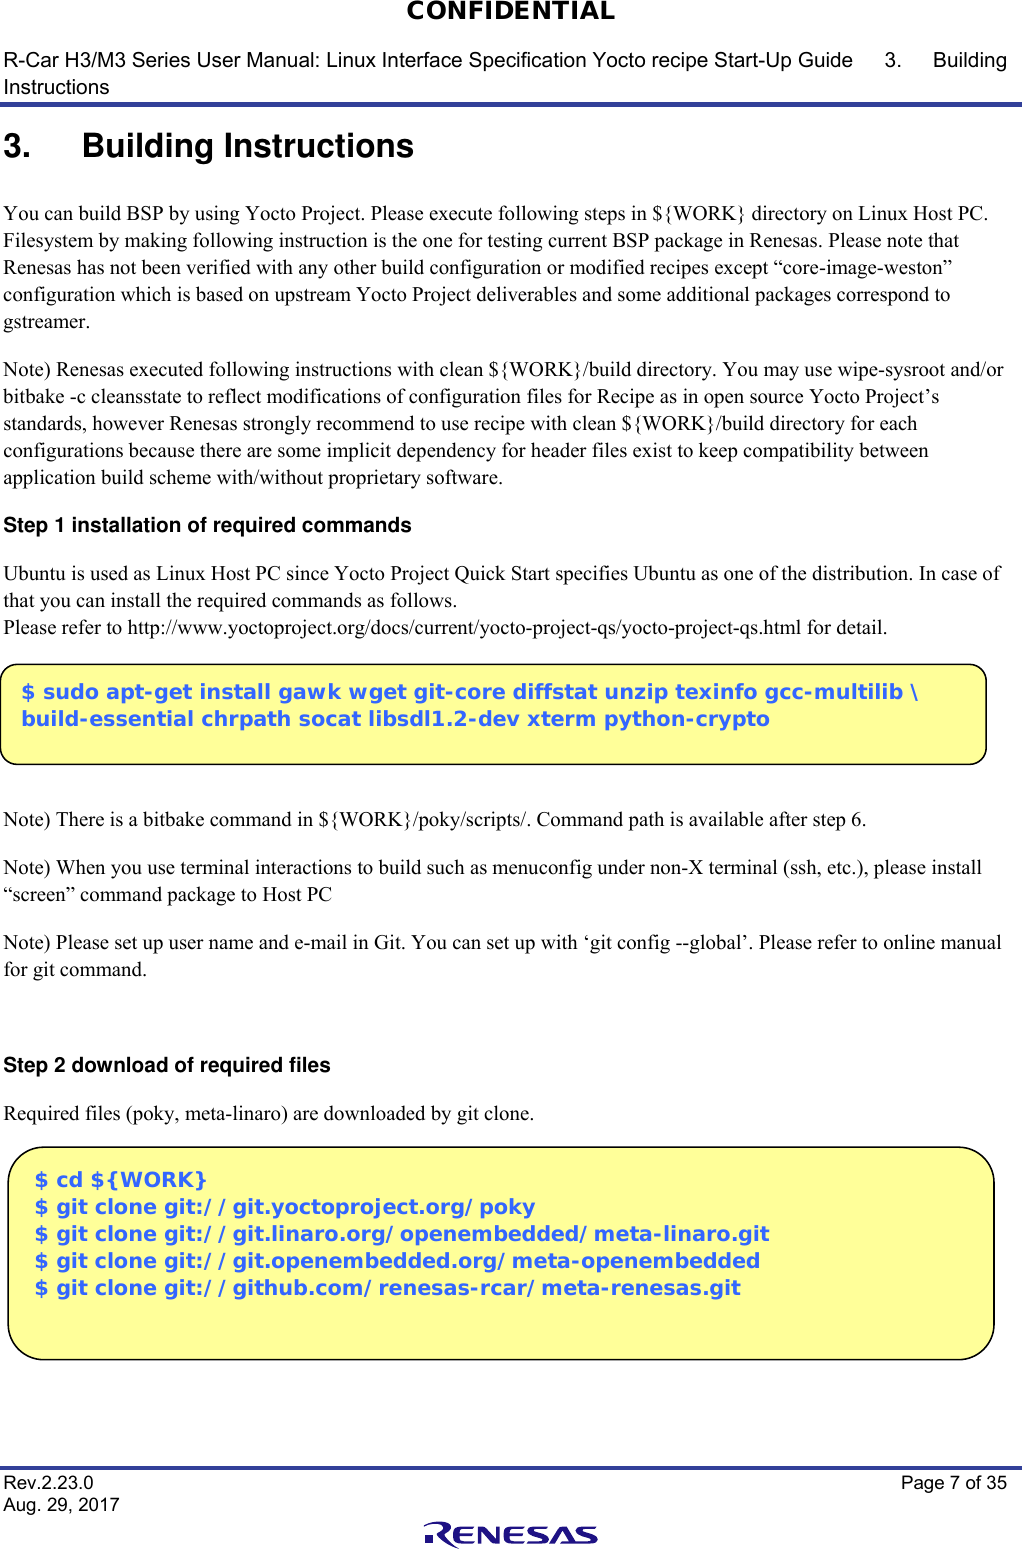 R Car H3/M3 Series User Manual: Linux Interface